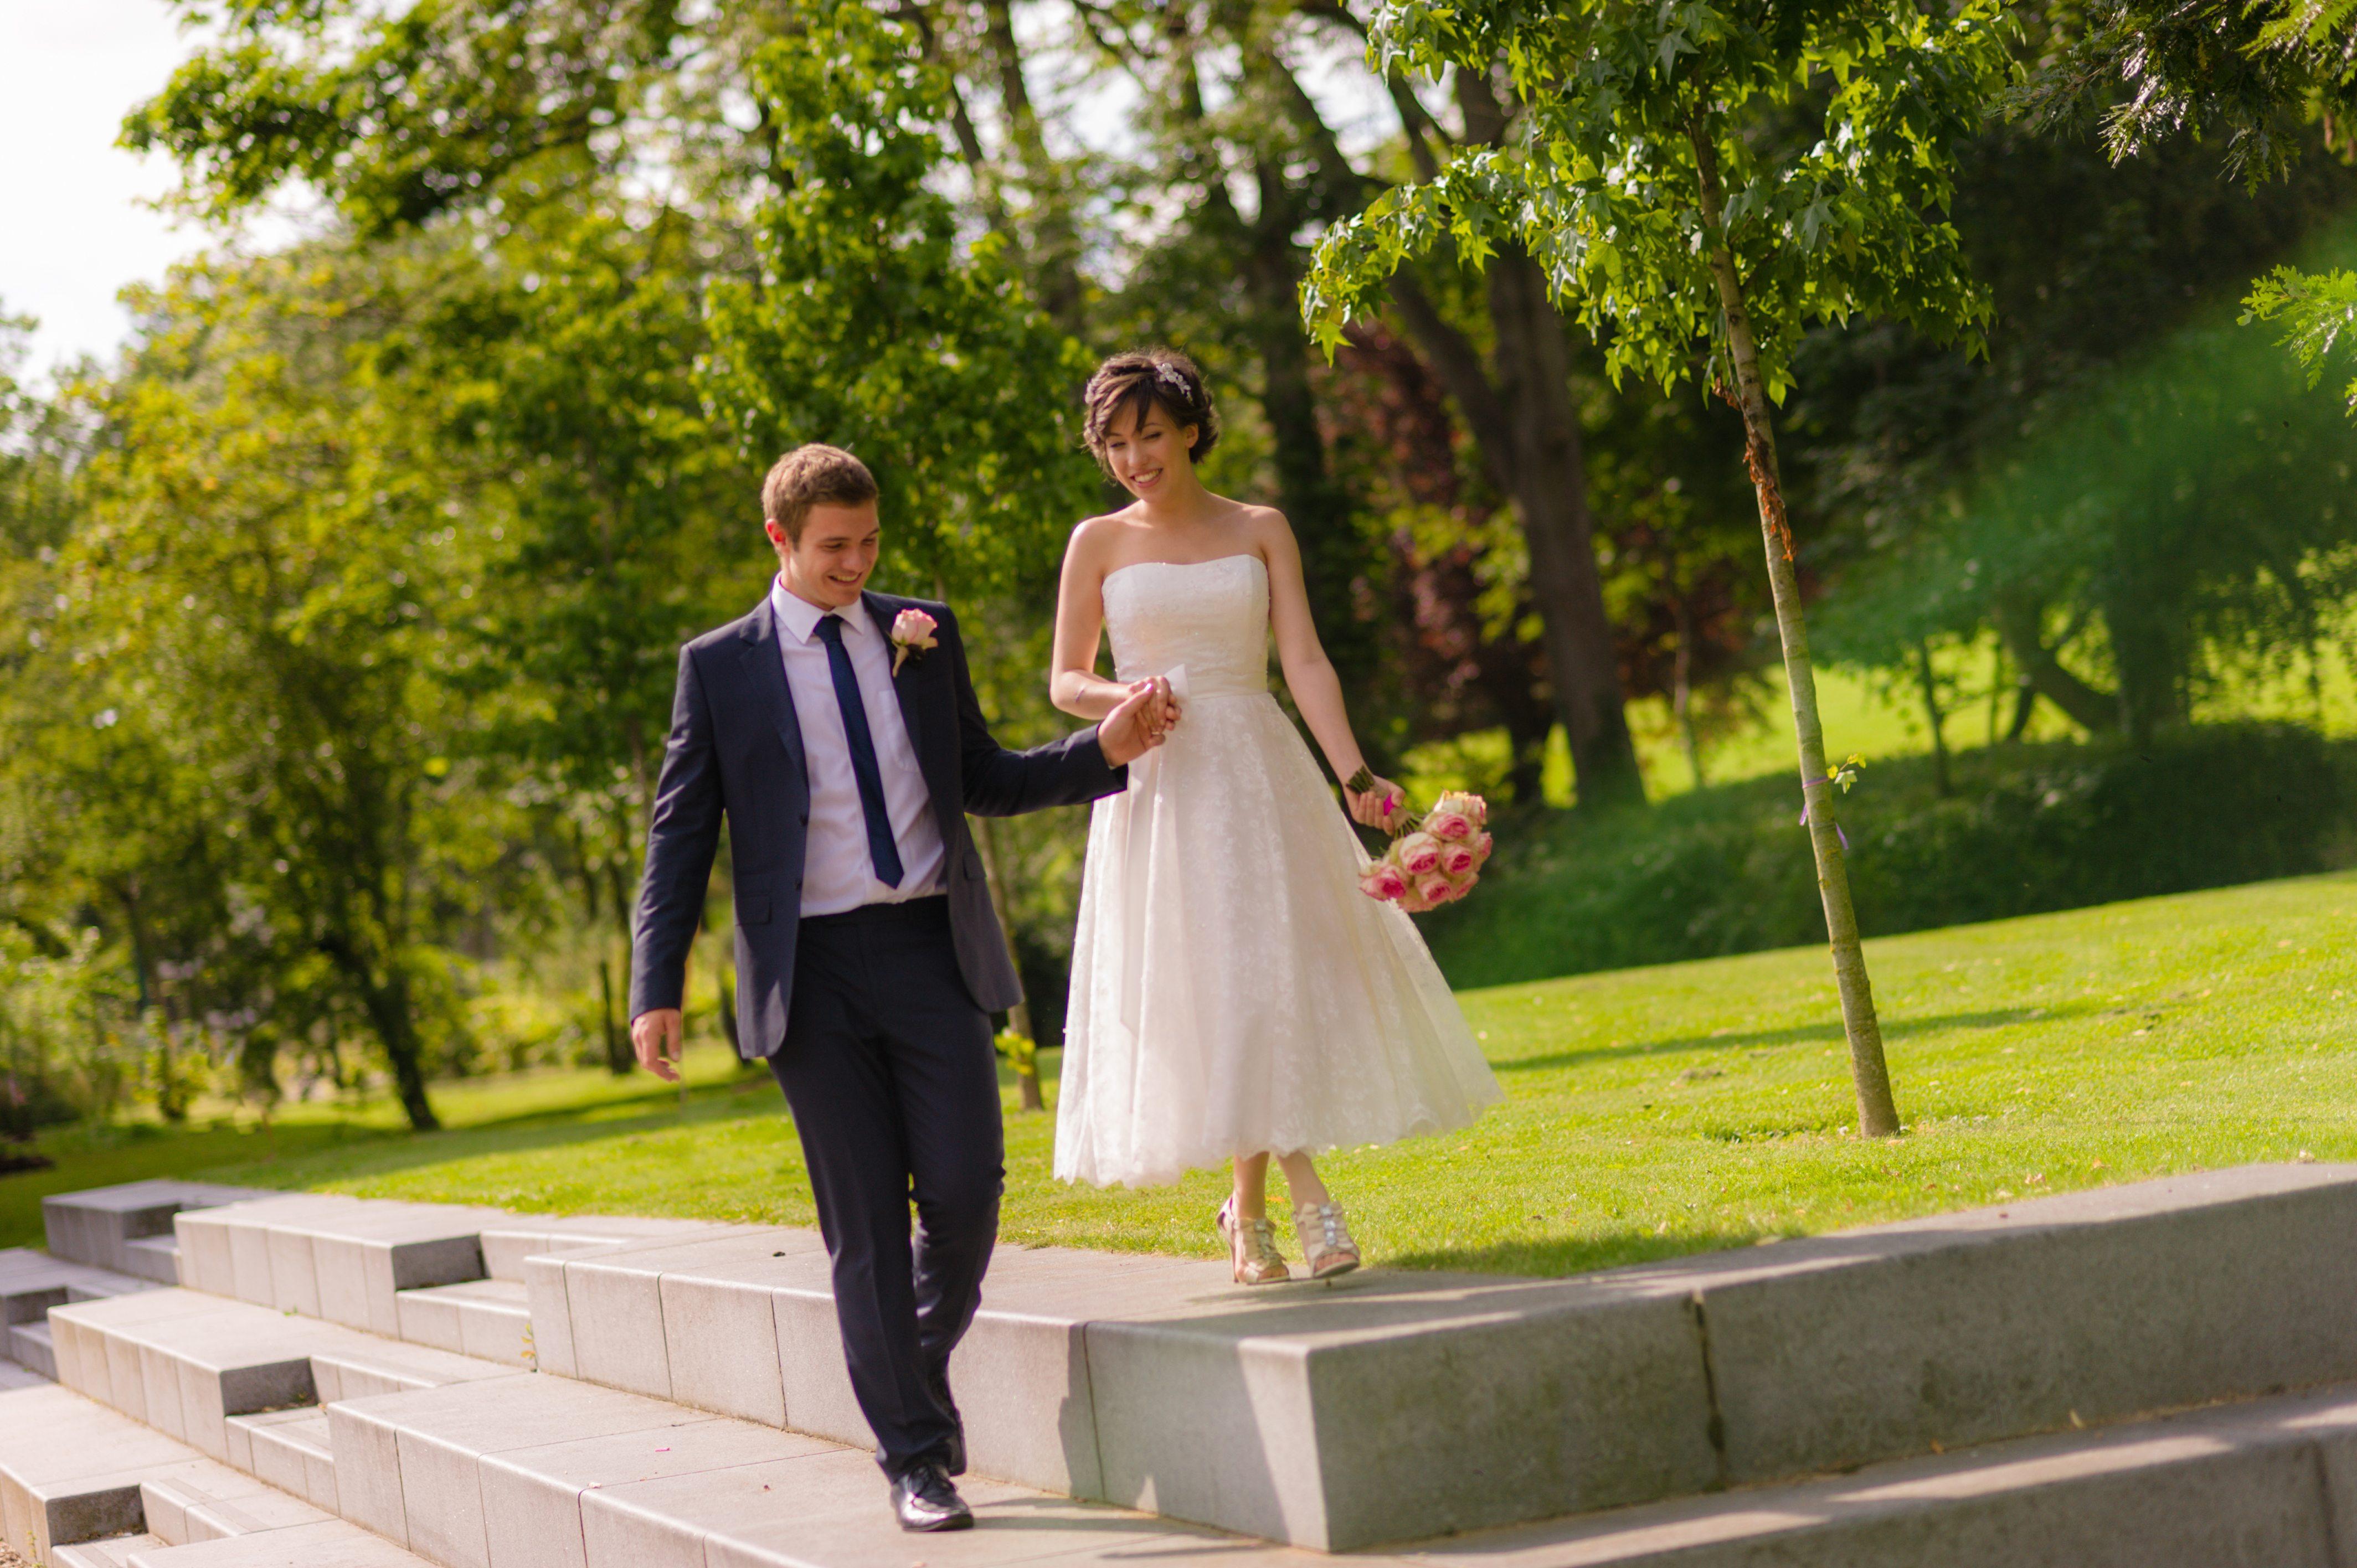 Wedding Venue in Sheffield